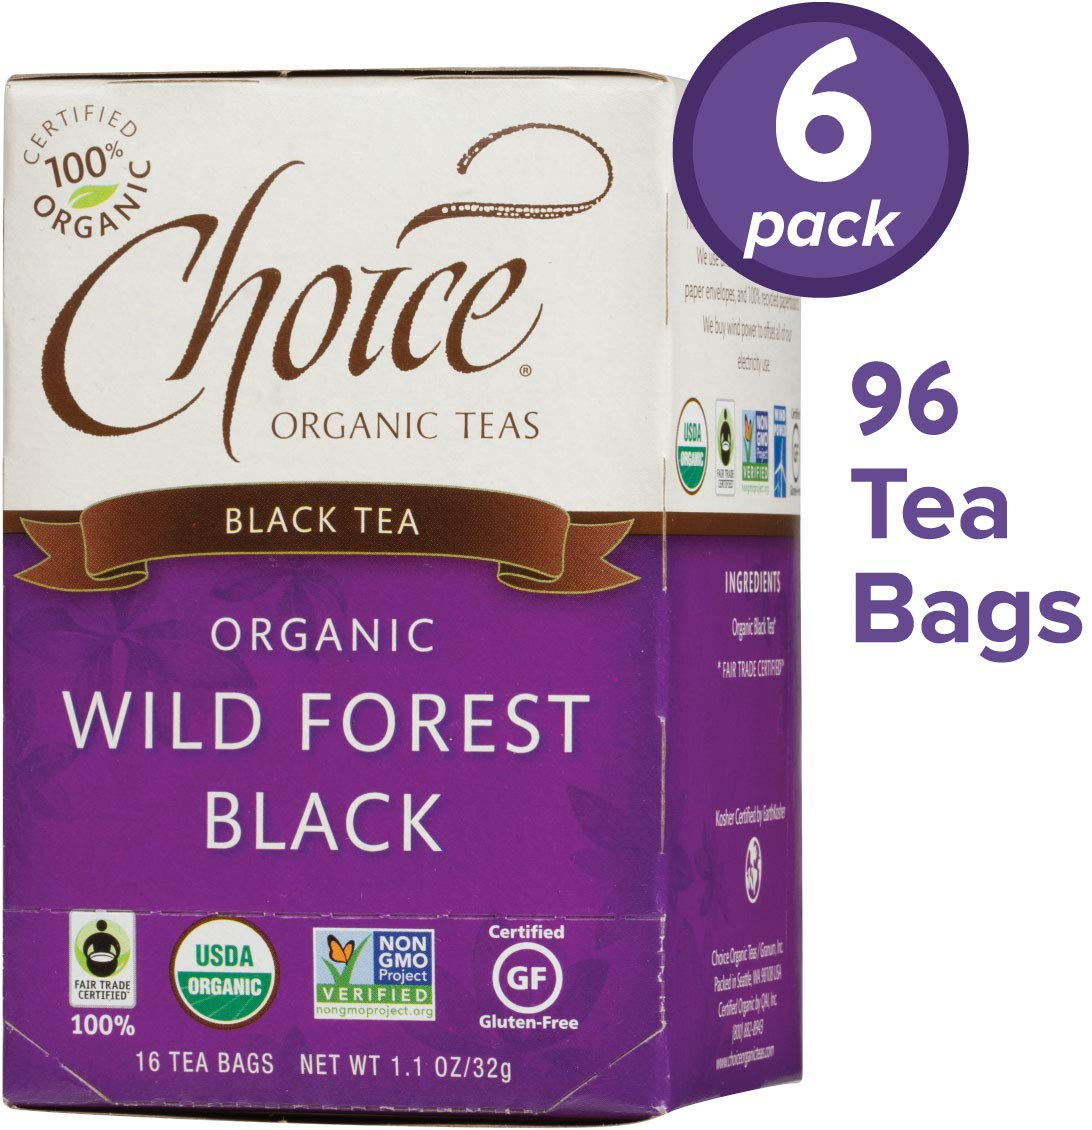 Choice Organic Teas Black Tea, 6 Boxes of 16 (96 Tea Bags), Wild Forest Black